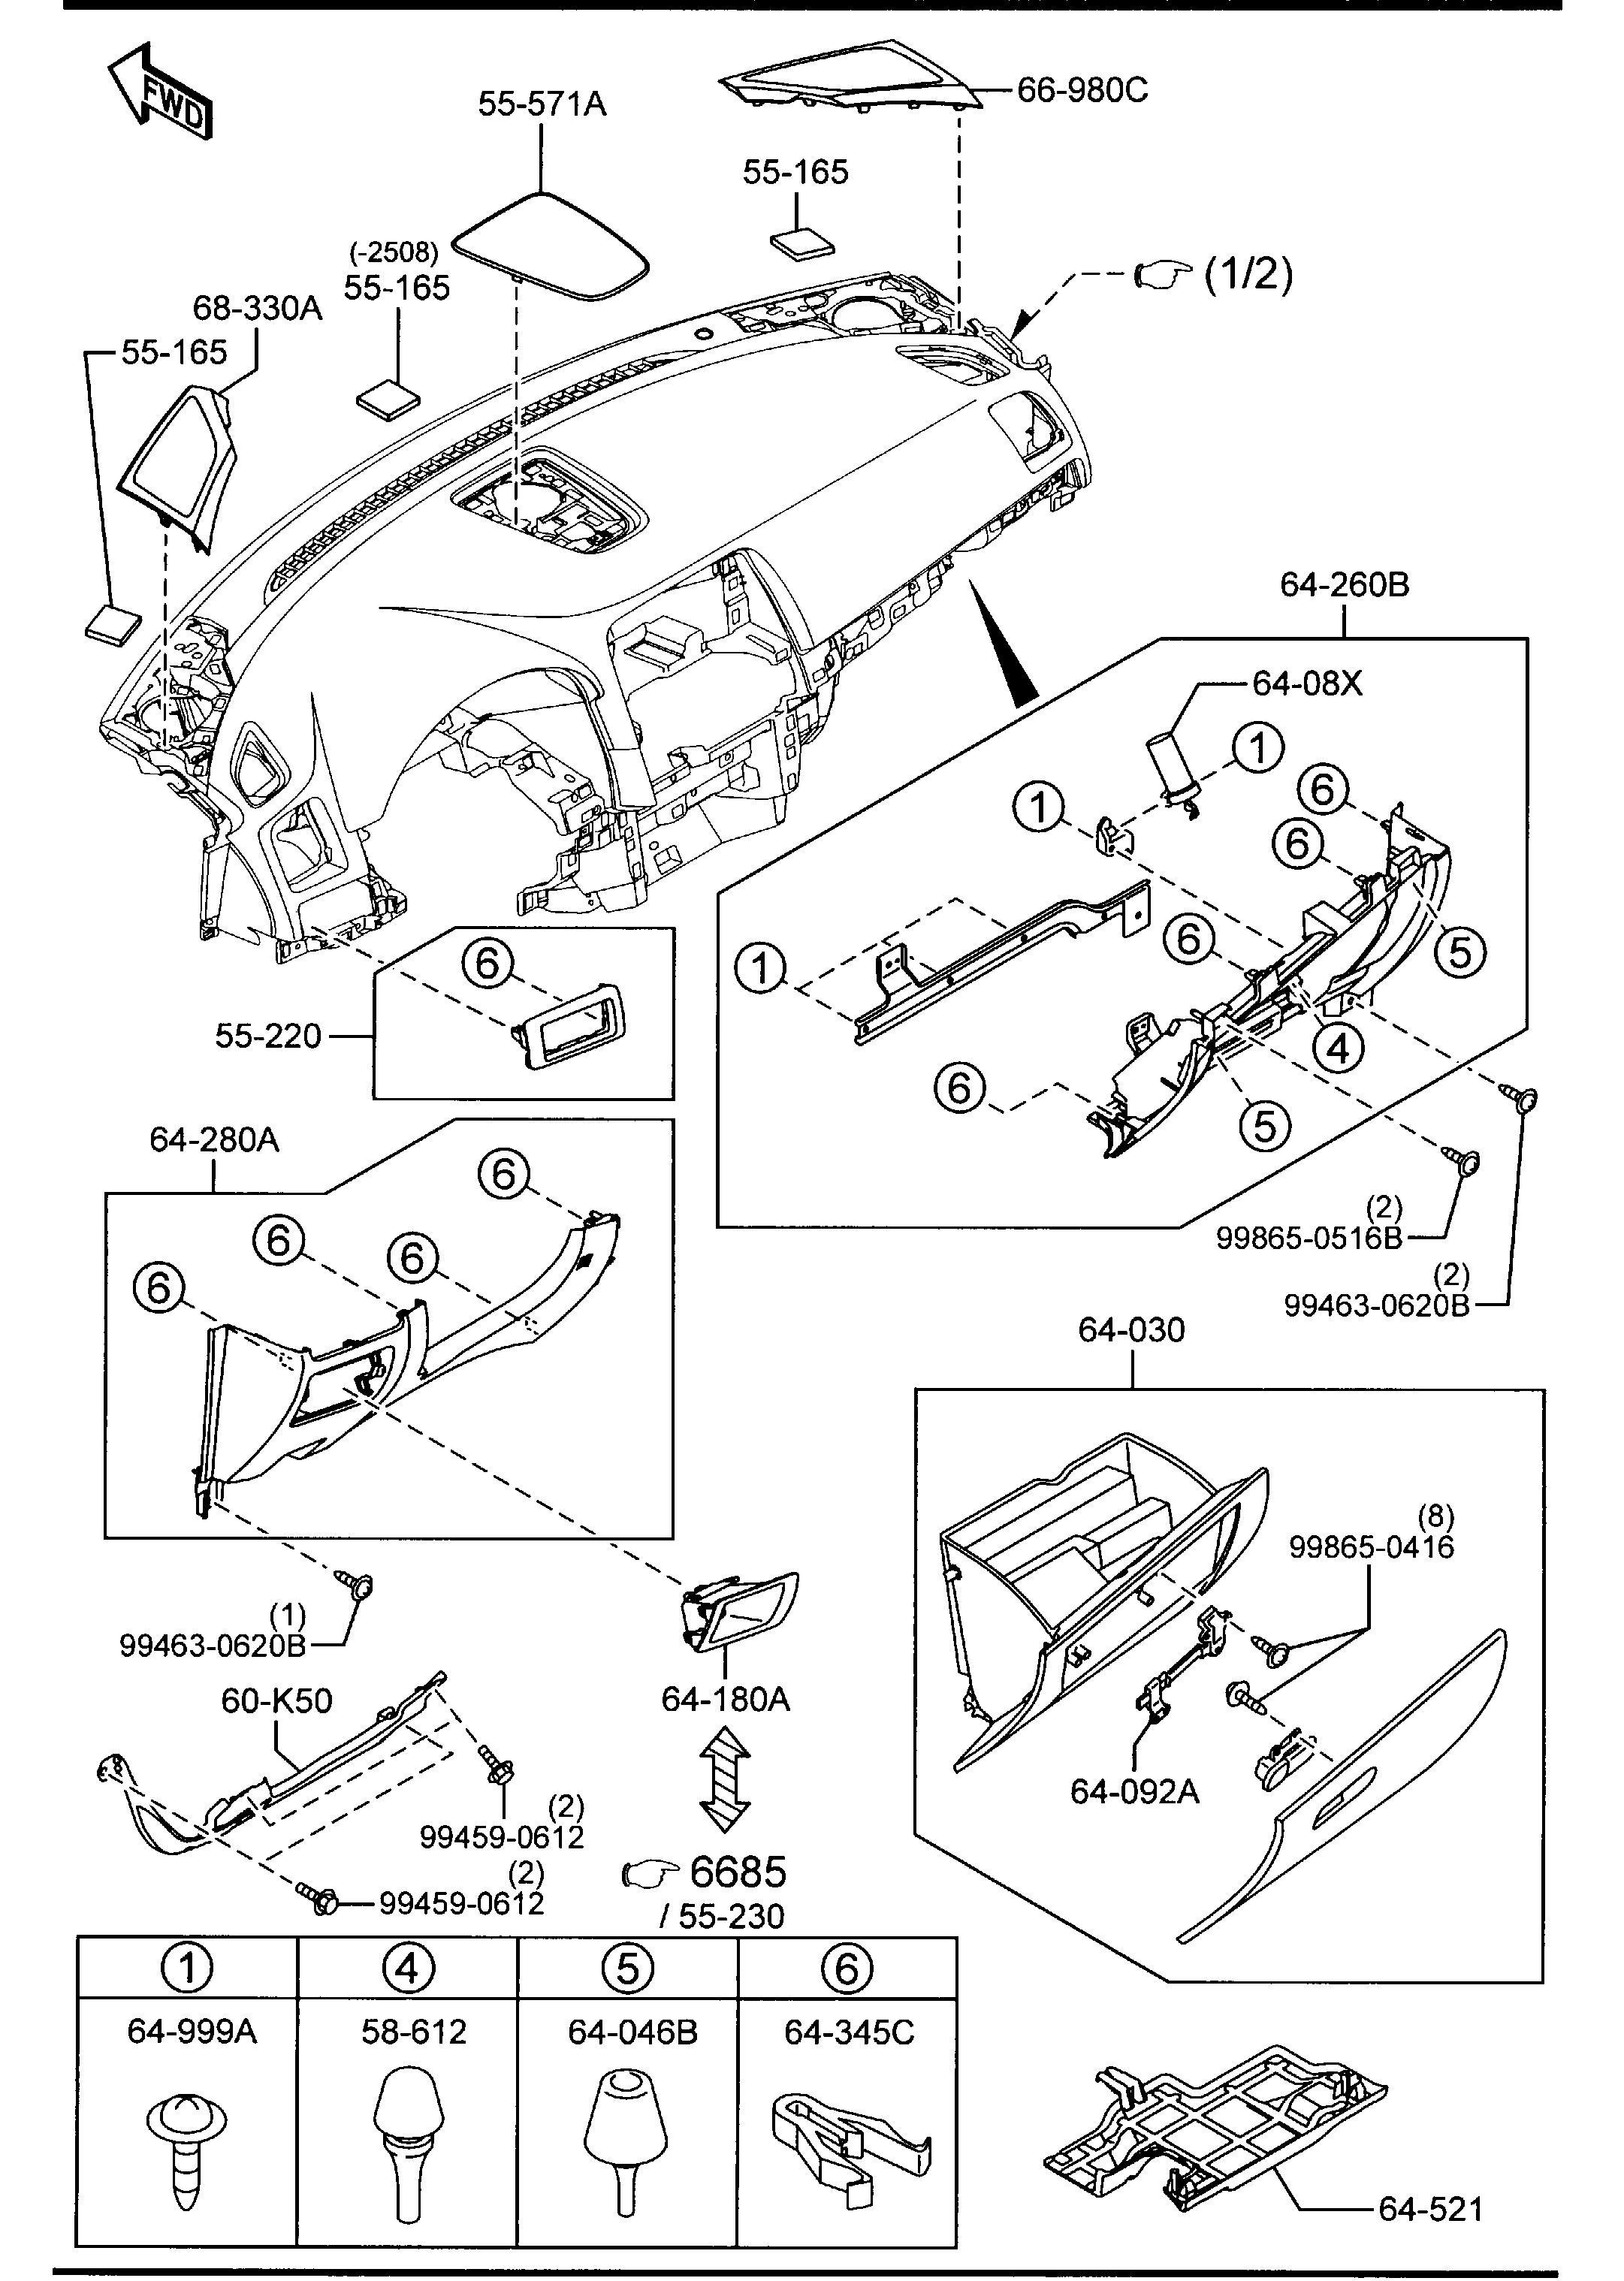 03 vw tdi engine belt diagram